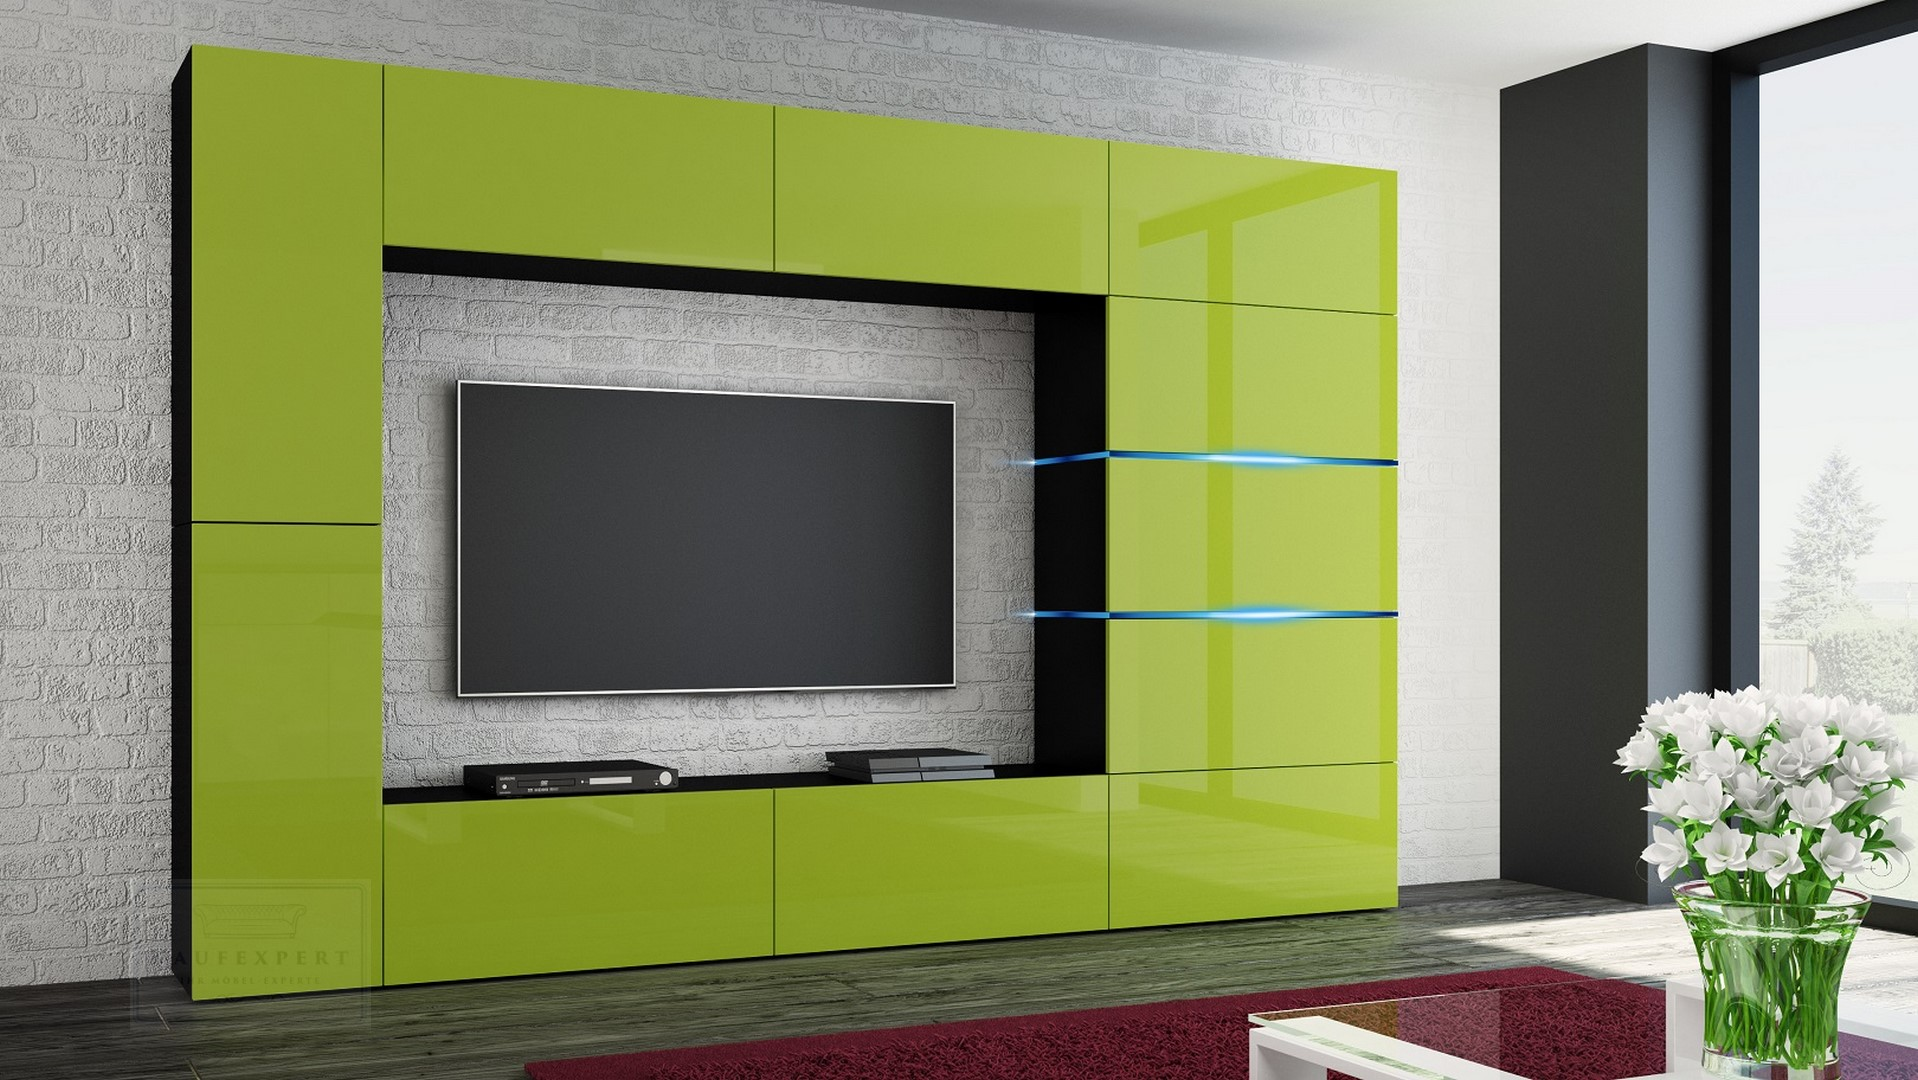 Hochwertig Wohnwand Shadow Lime Hochglanz/Schwarz 285 Cm Mediawand Anbauwand  Medienwand Design Modern Led Beleuchtung Hochglanz